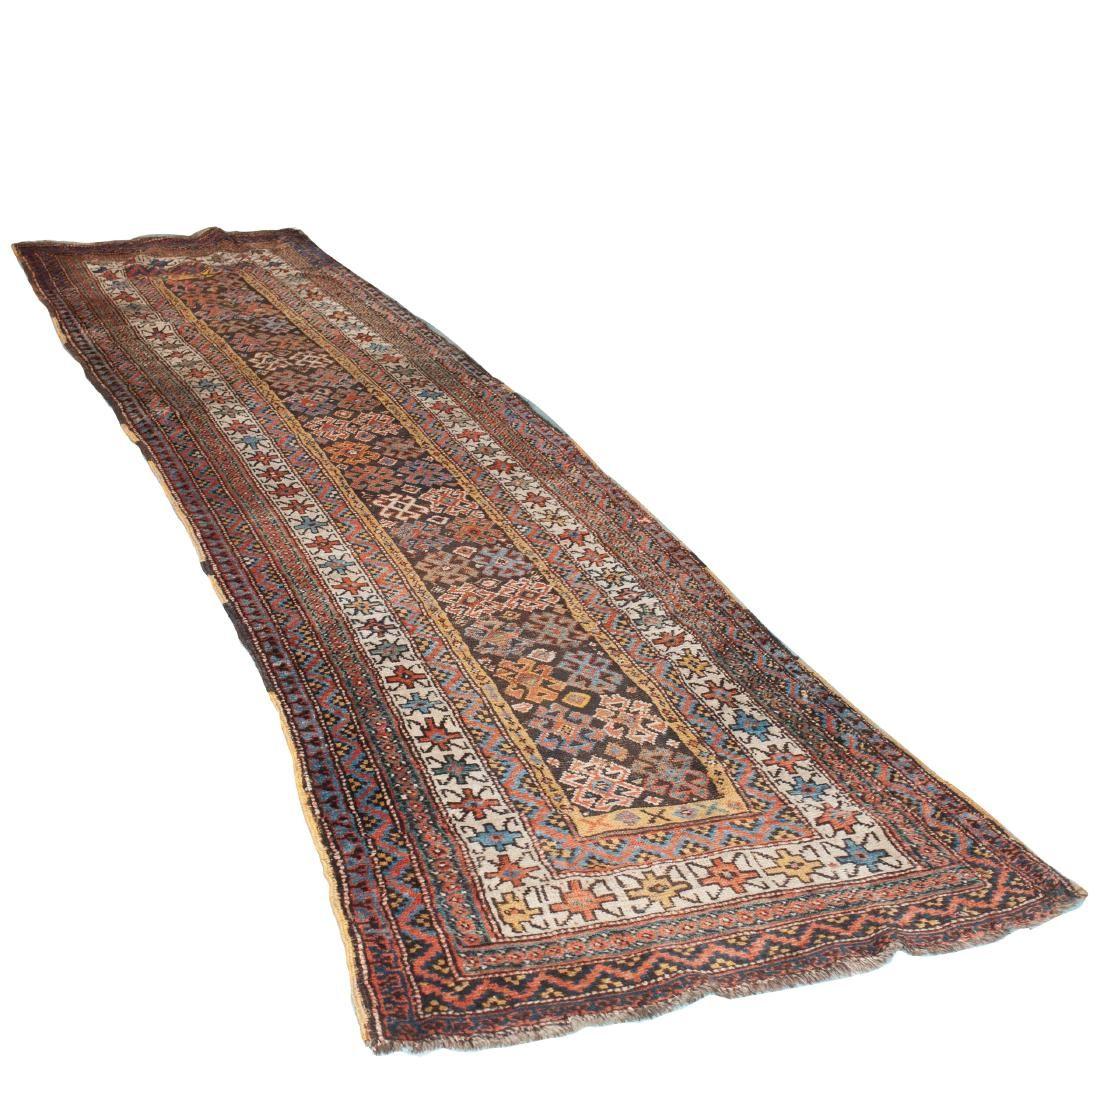 Possibly Caucasian Kazak Wool Runner Rug